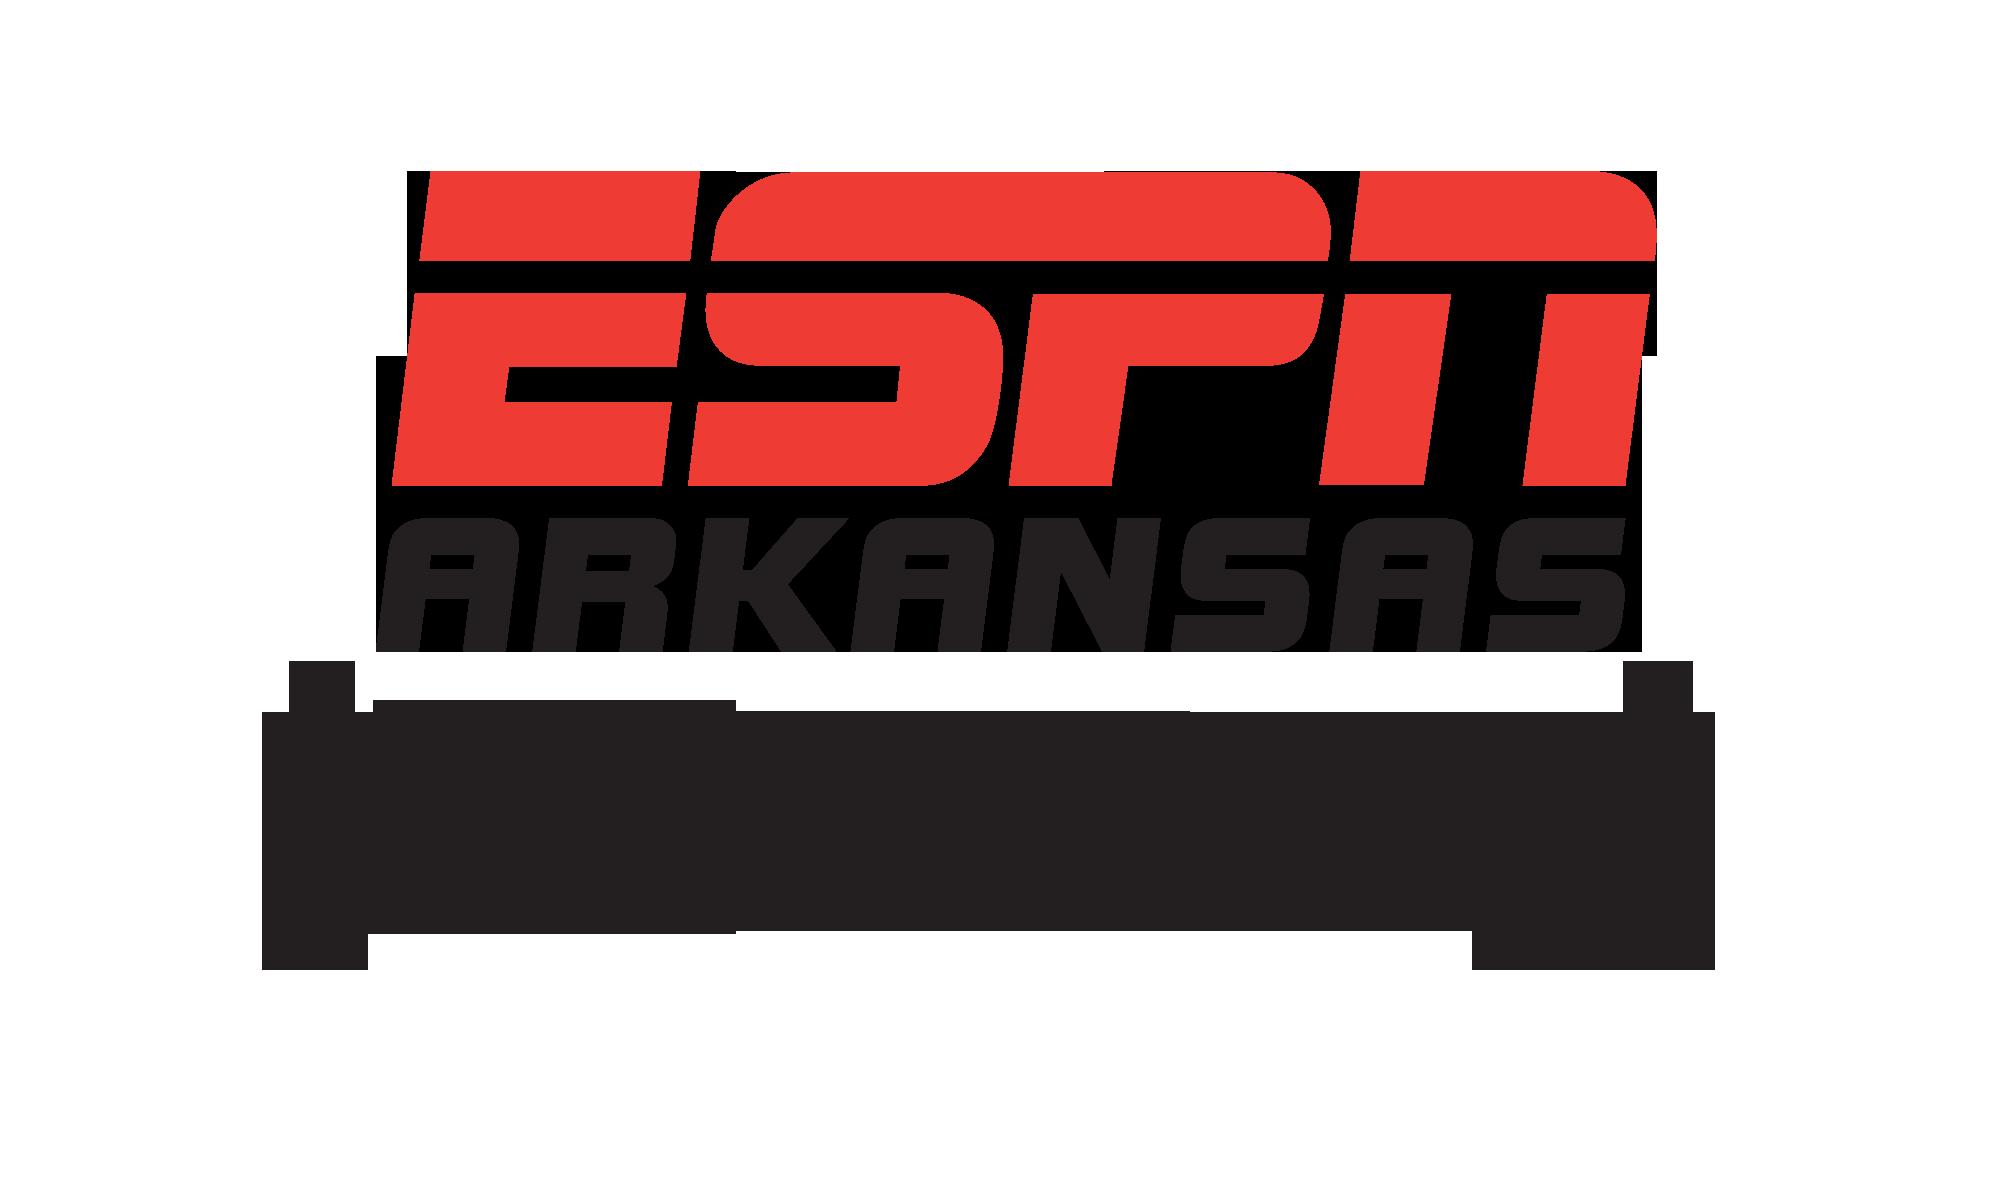 95.3 ESPN Radio